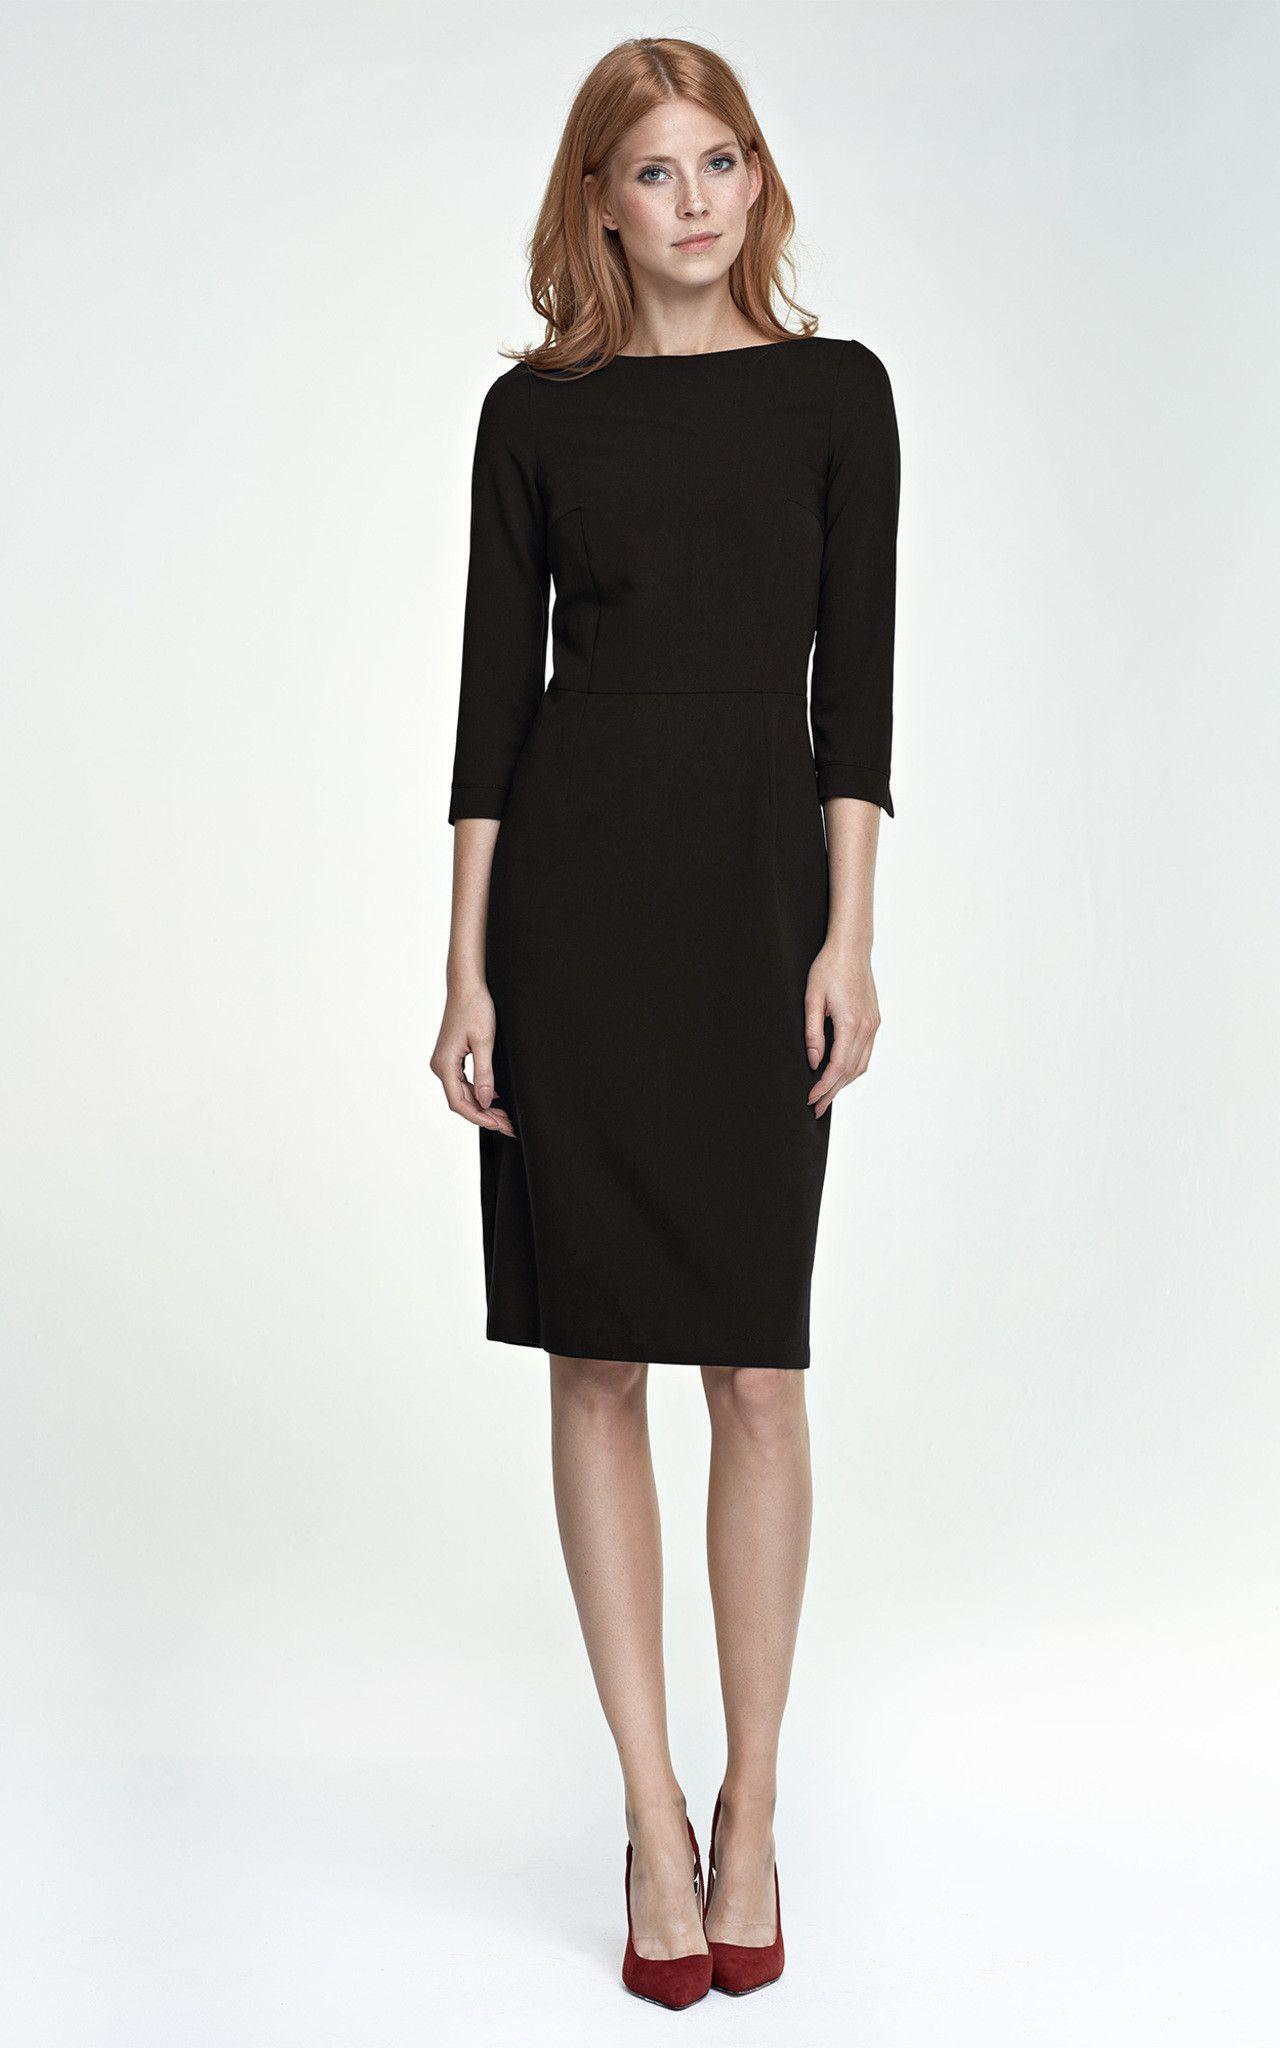 Classic Dress Silkfred Dresses Fashion Black Mid Length Dress [ 2048 x 1280 Pixel ]